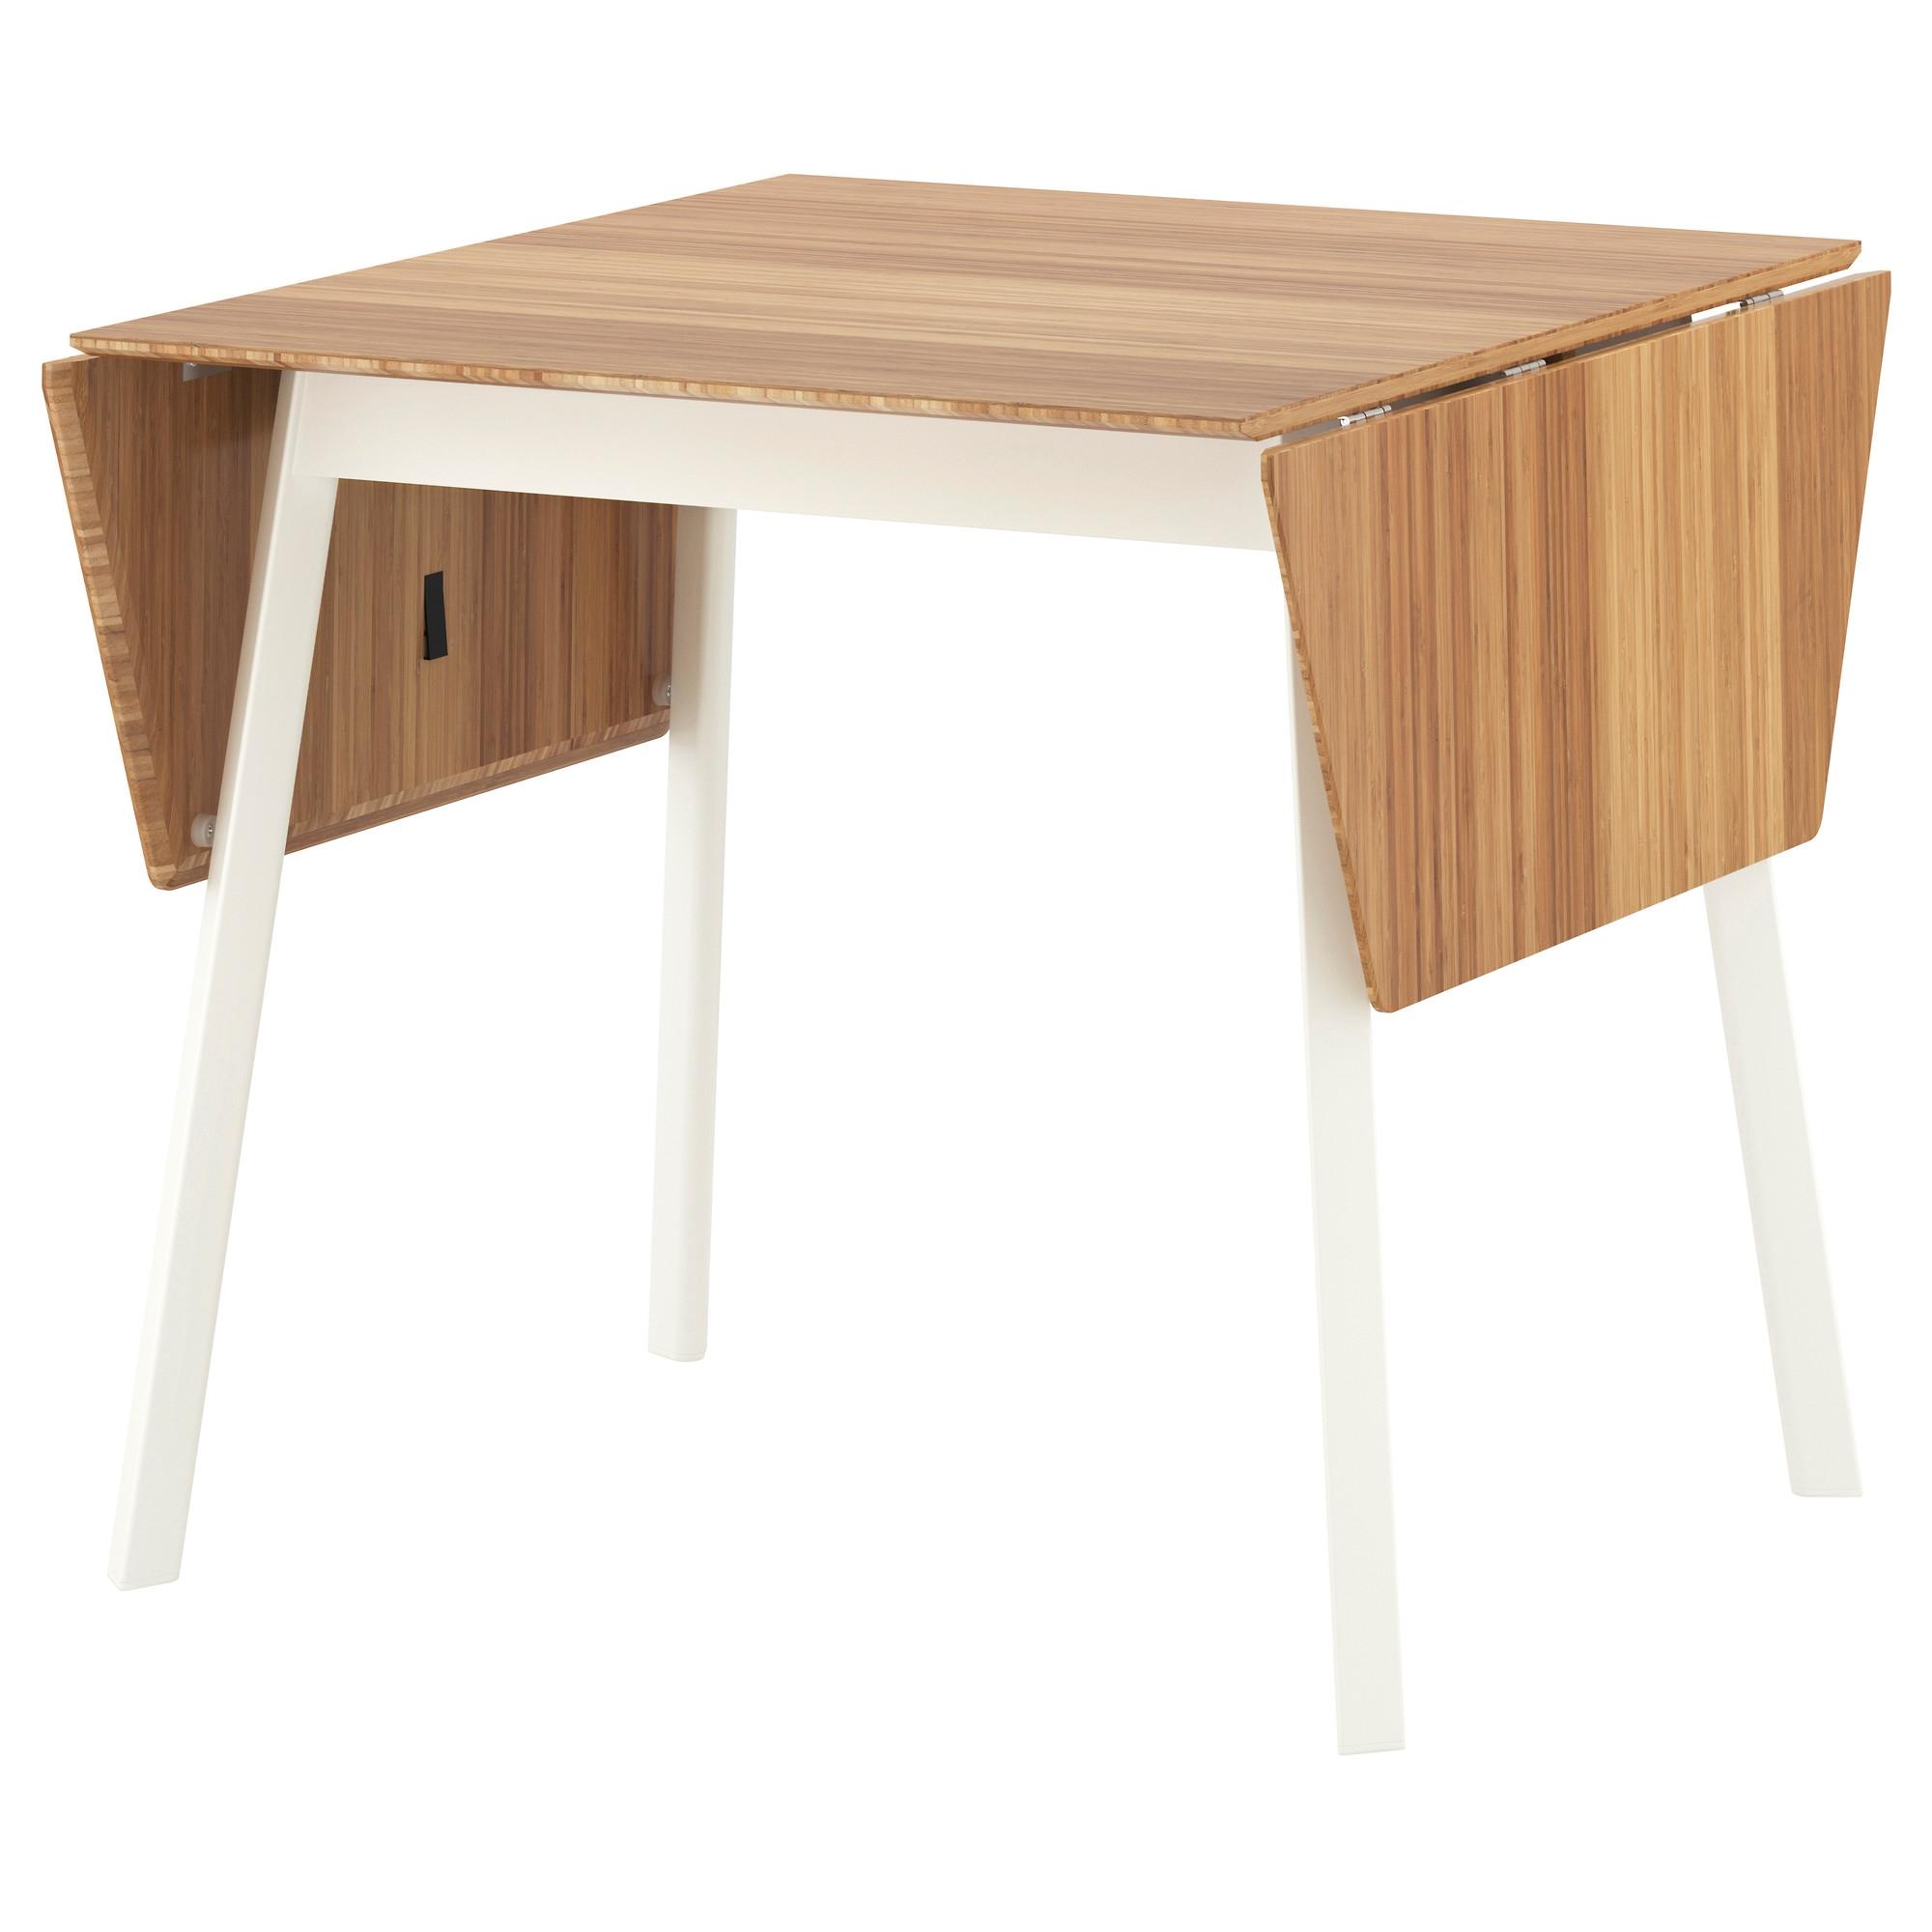 cdigo mesas altas ikea - Mesas Altas Ikea